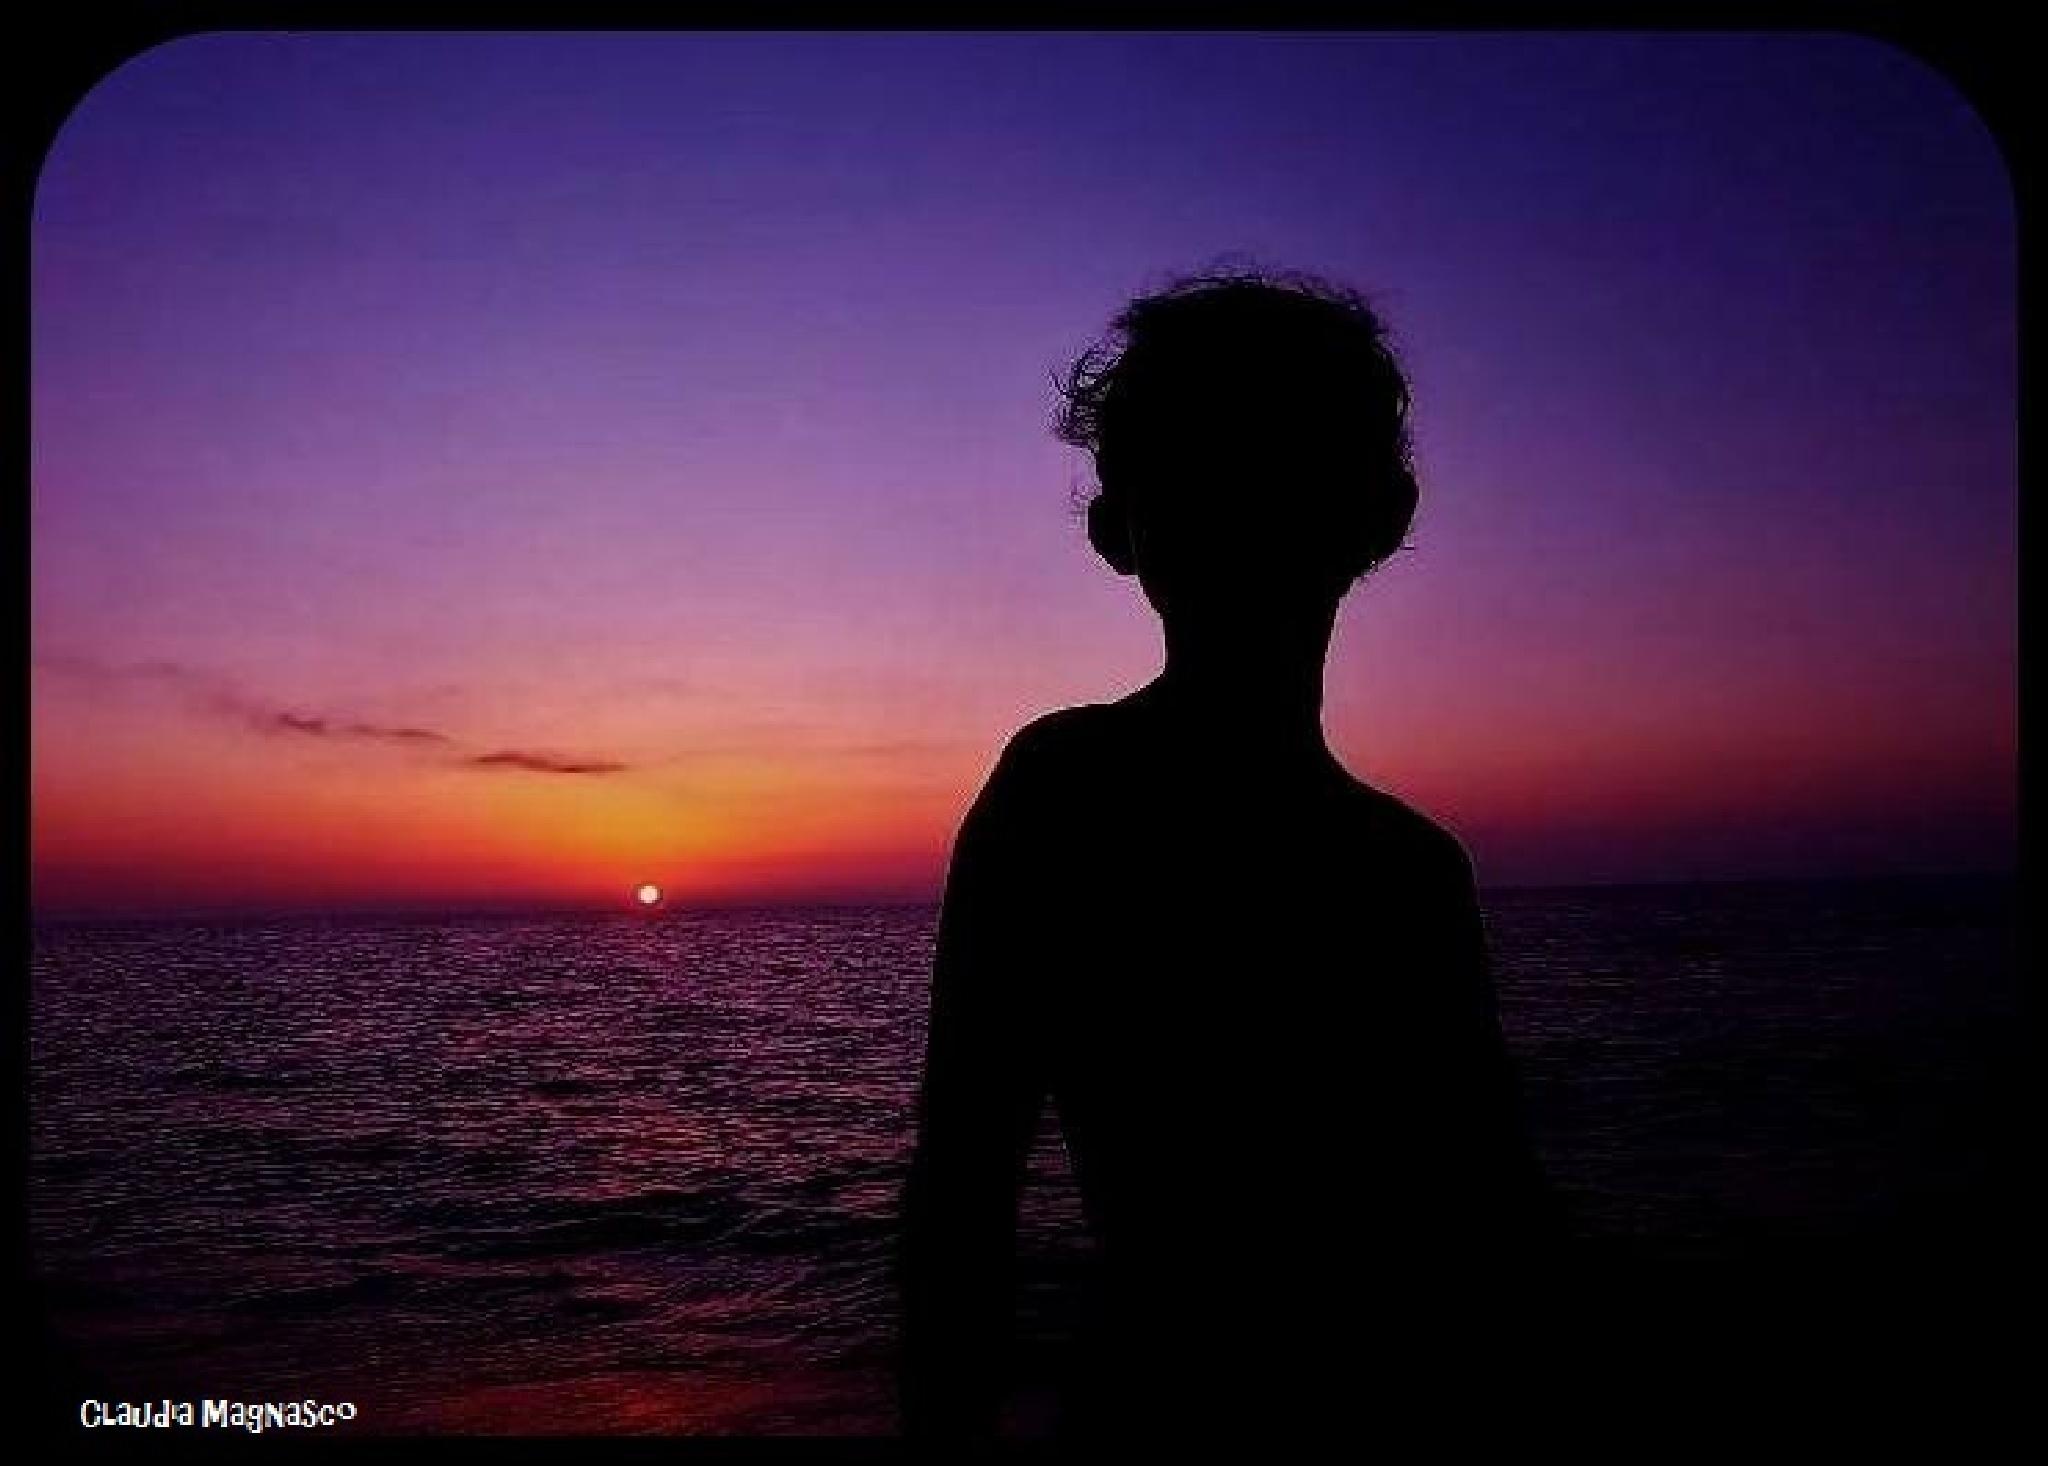 Looking for tomorrow by claudiamagnasco